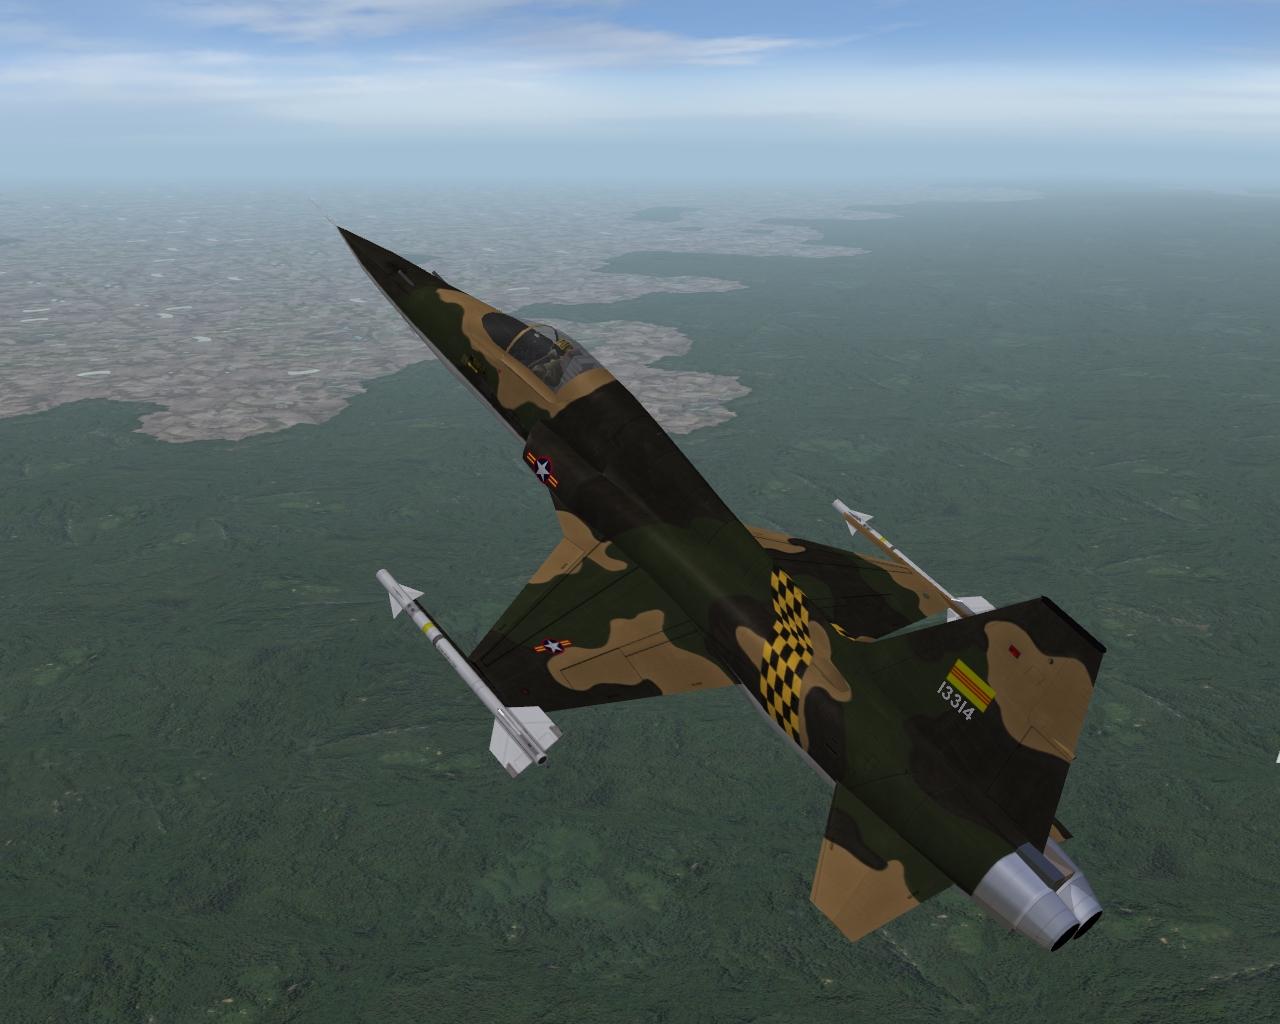 F-5A South Vietnam Air Force (VNAF) skin